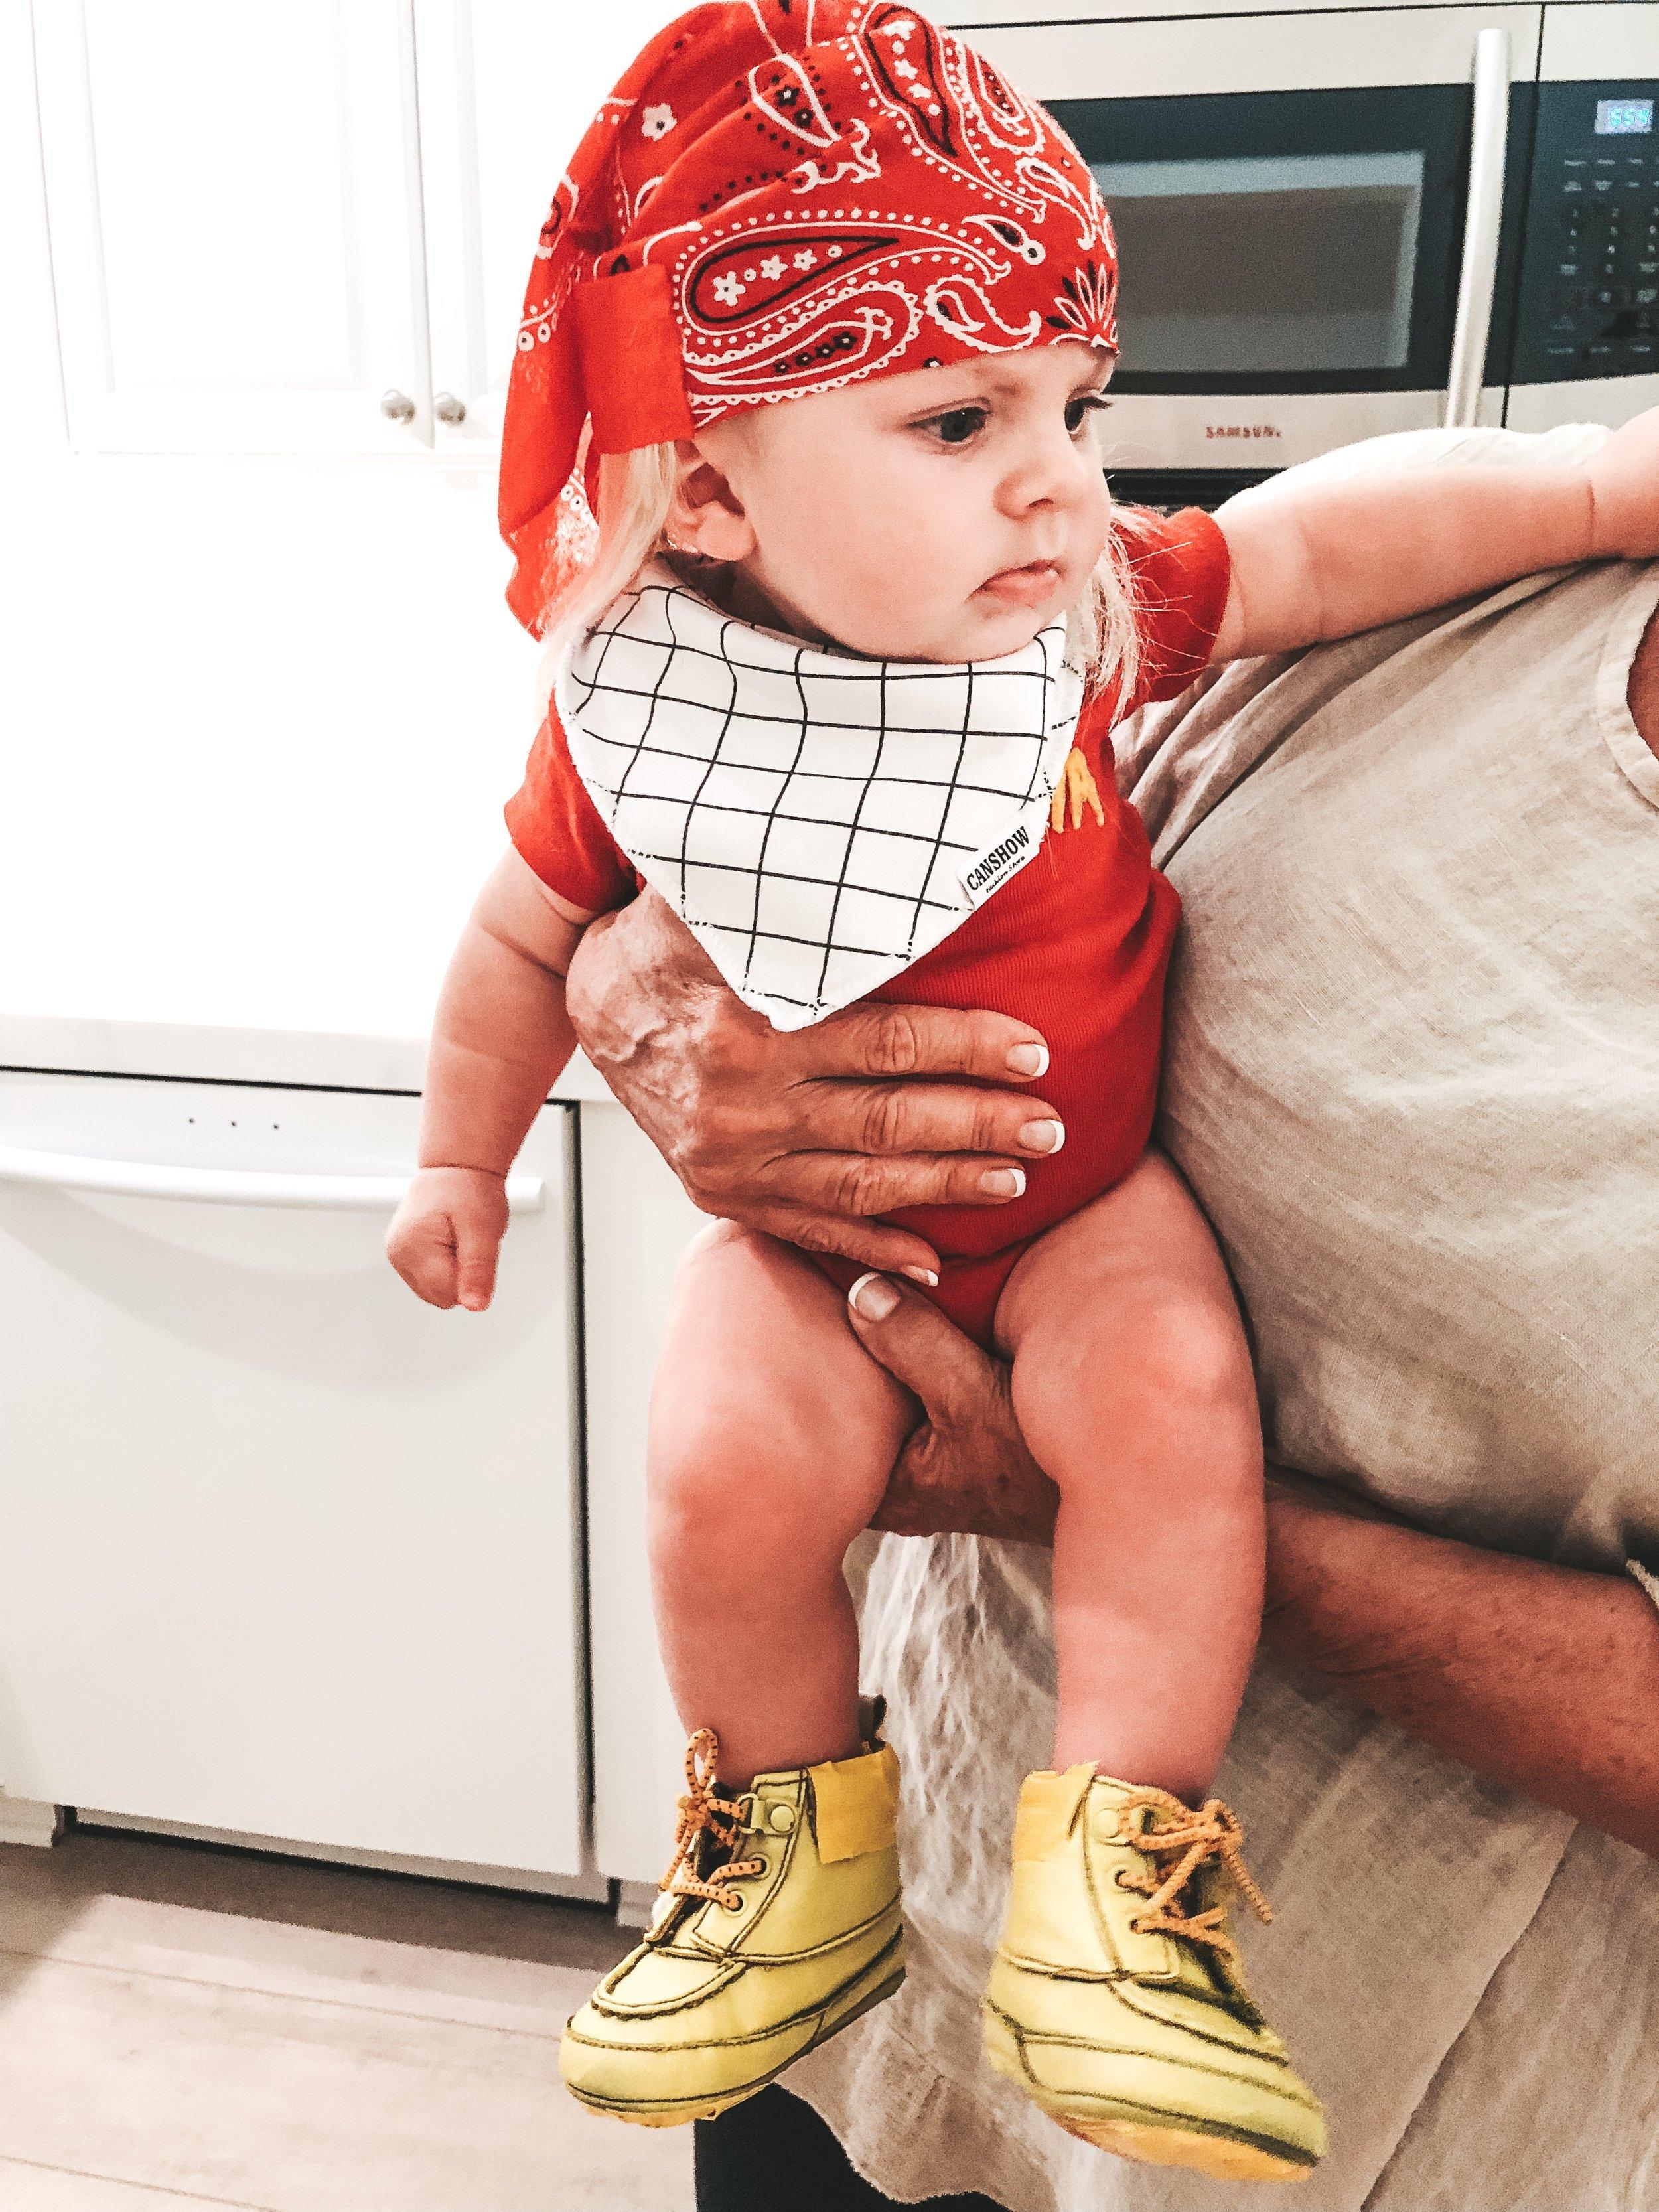 Baby's first Halloween.  DIY Hulk Hogan costume for baby.